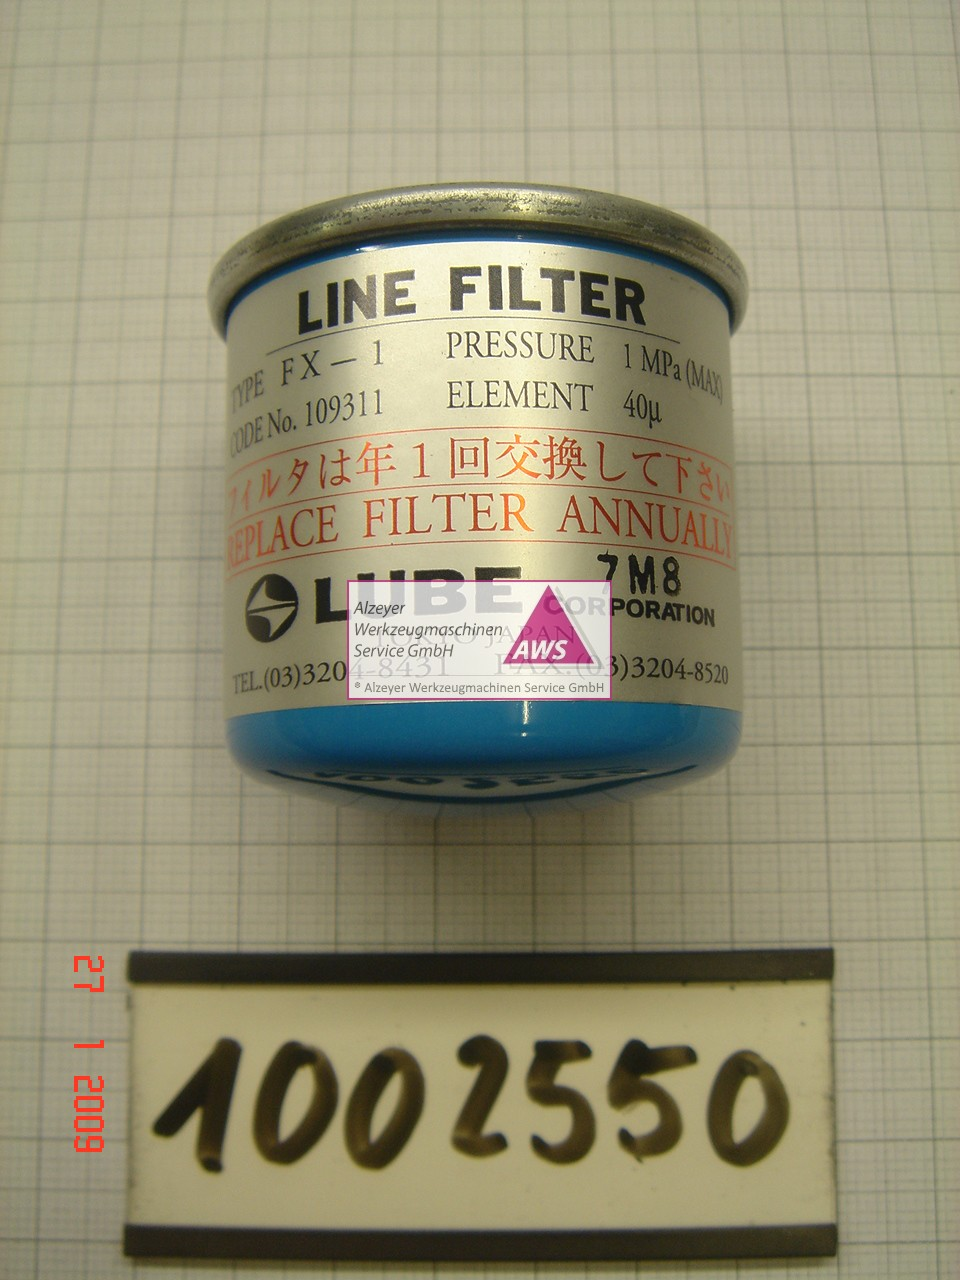 FX1 Filter (blau)